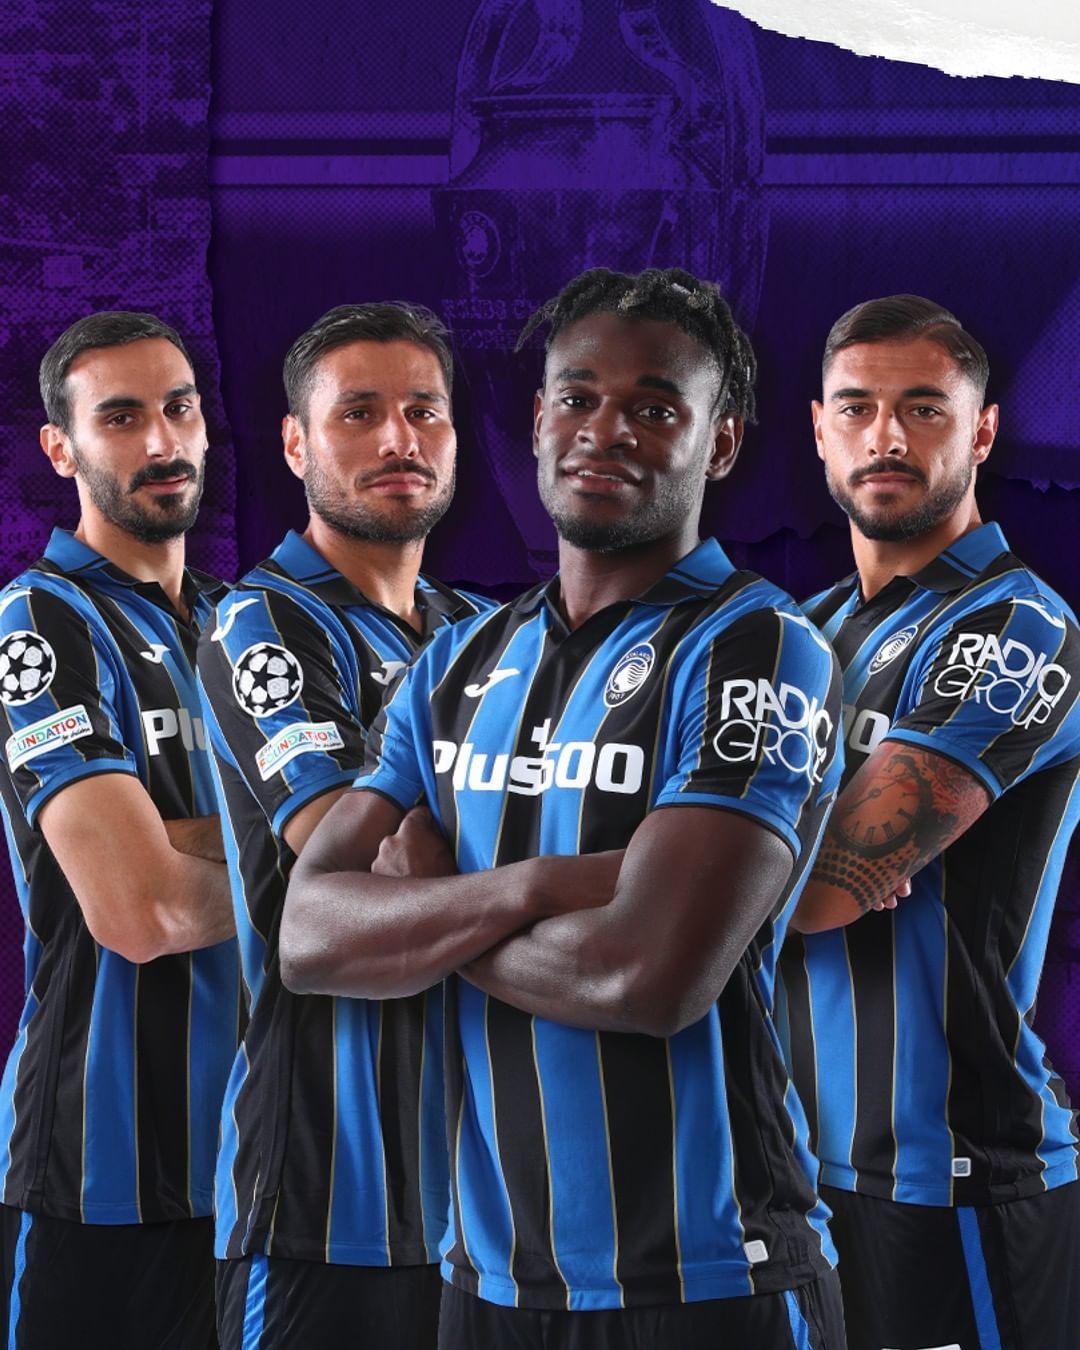 Camisa Champions League 2021-2022 JOMA a